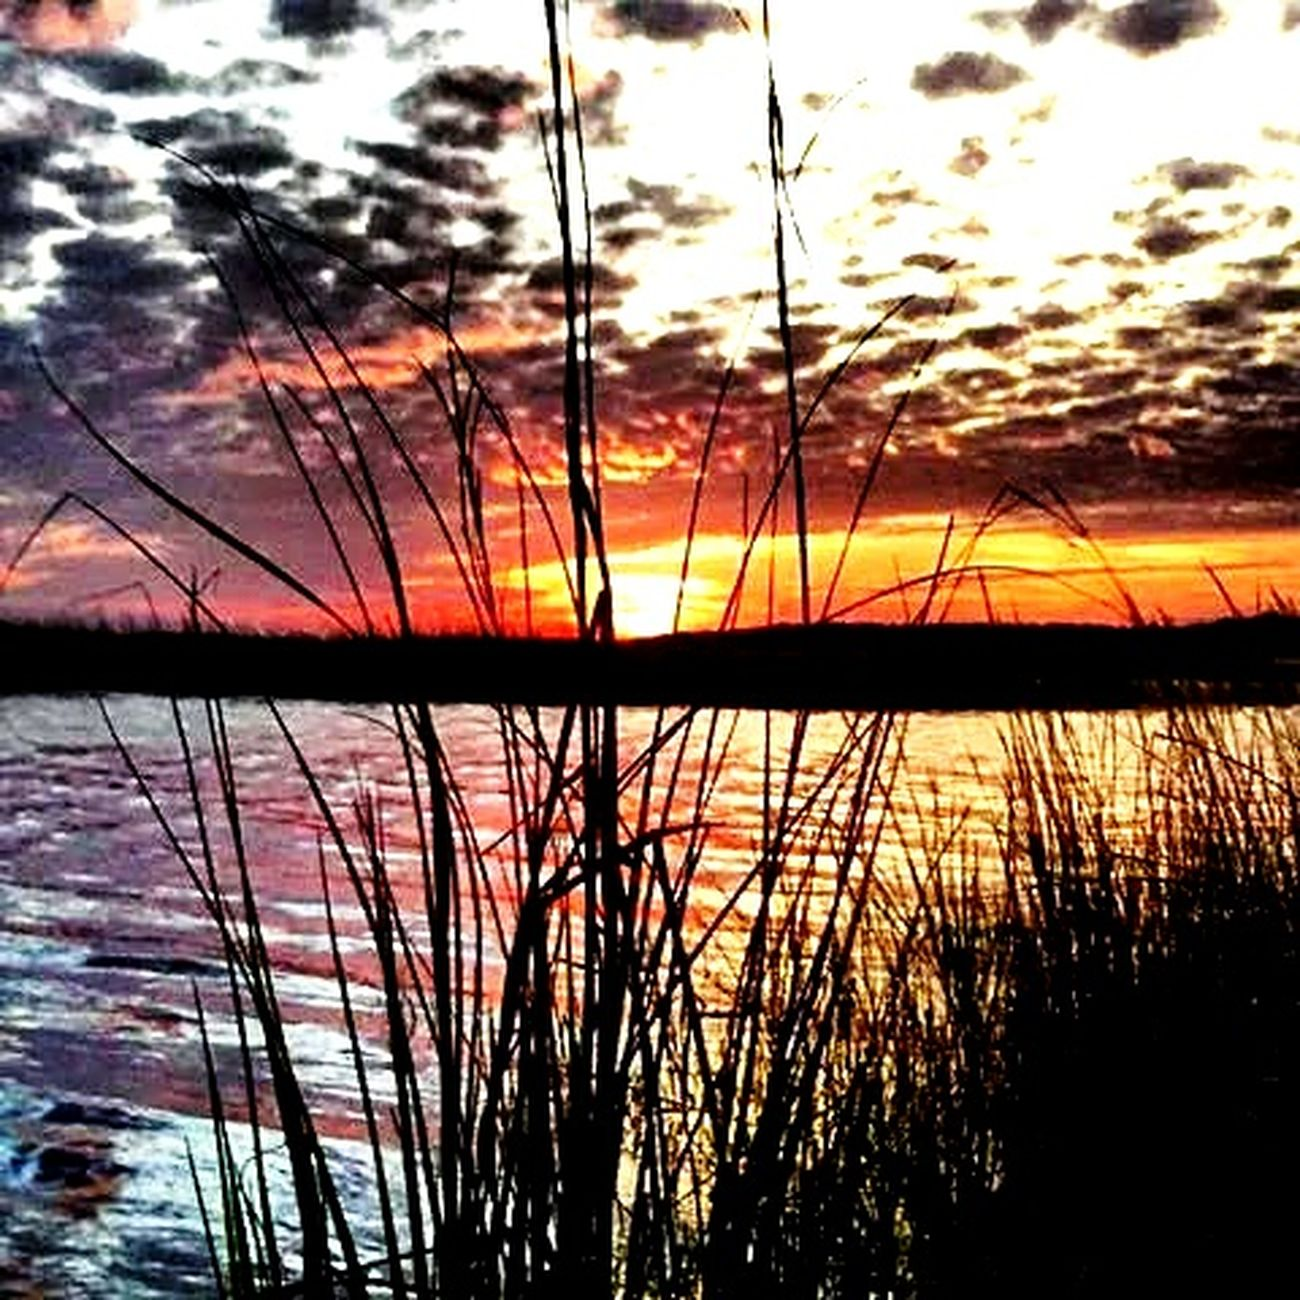 Sunset #sun #clouds #skylovers #sky #nature #beautifulinnature #naturalbeauty #photography #landscape Hello World Learn & Shoot: Simplicity Simplicity Sunset Harbor Nc EyeEm Best Shots - Sunsets + Sunrise Sunset_collection EyeEm Sunset Sunsetporn